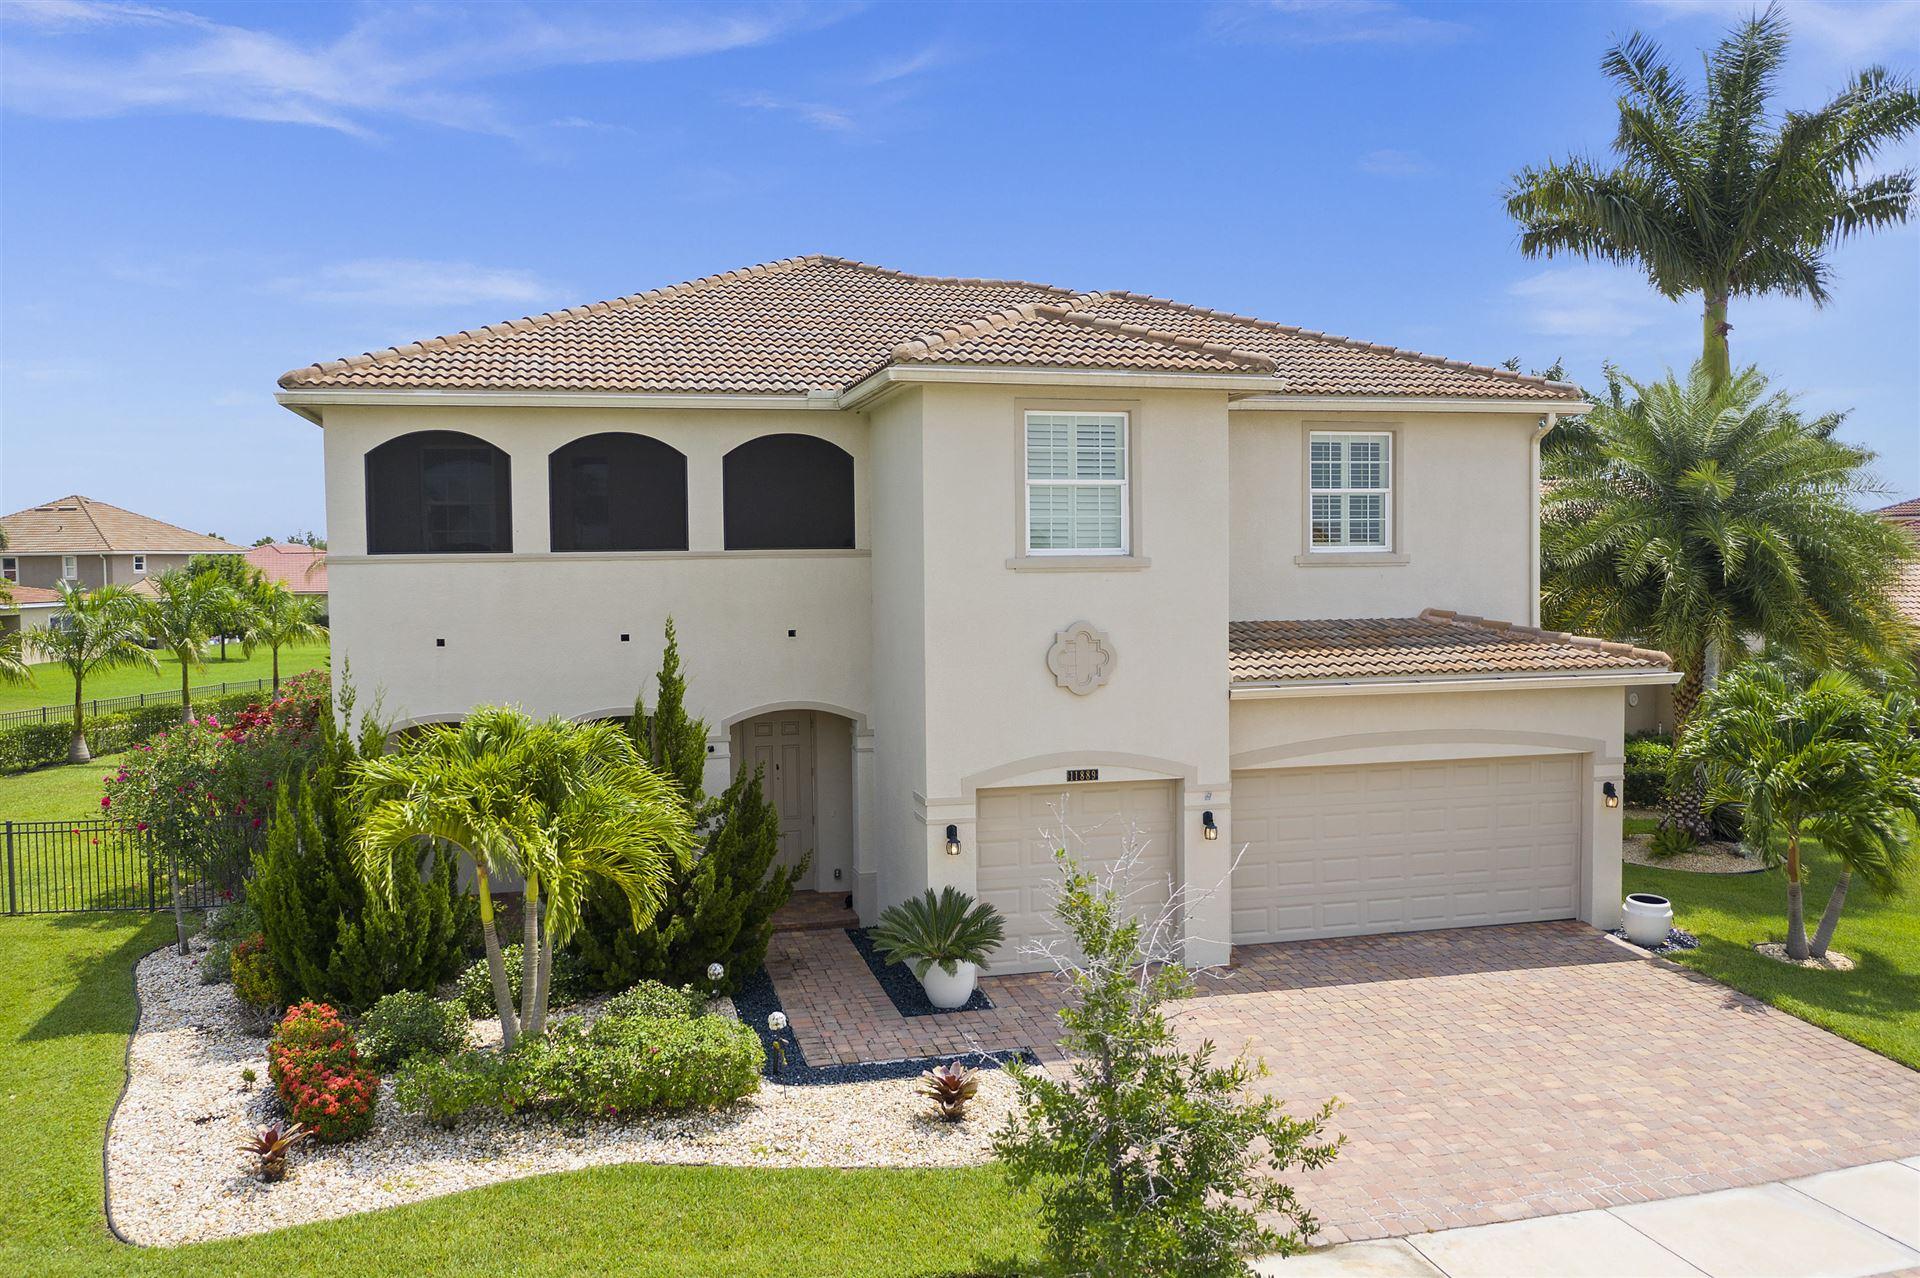 11889 SW Aventino Drive, Port Saint Lucie, FL 34987 - #: RX-10638742